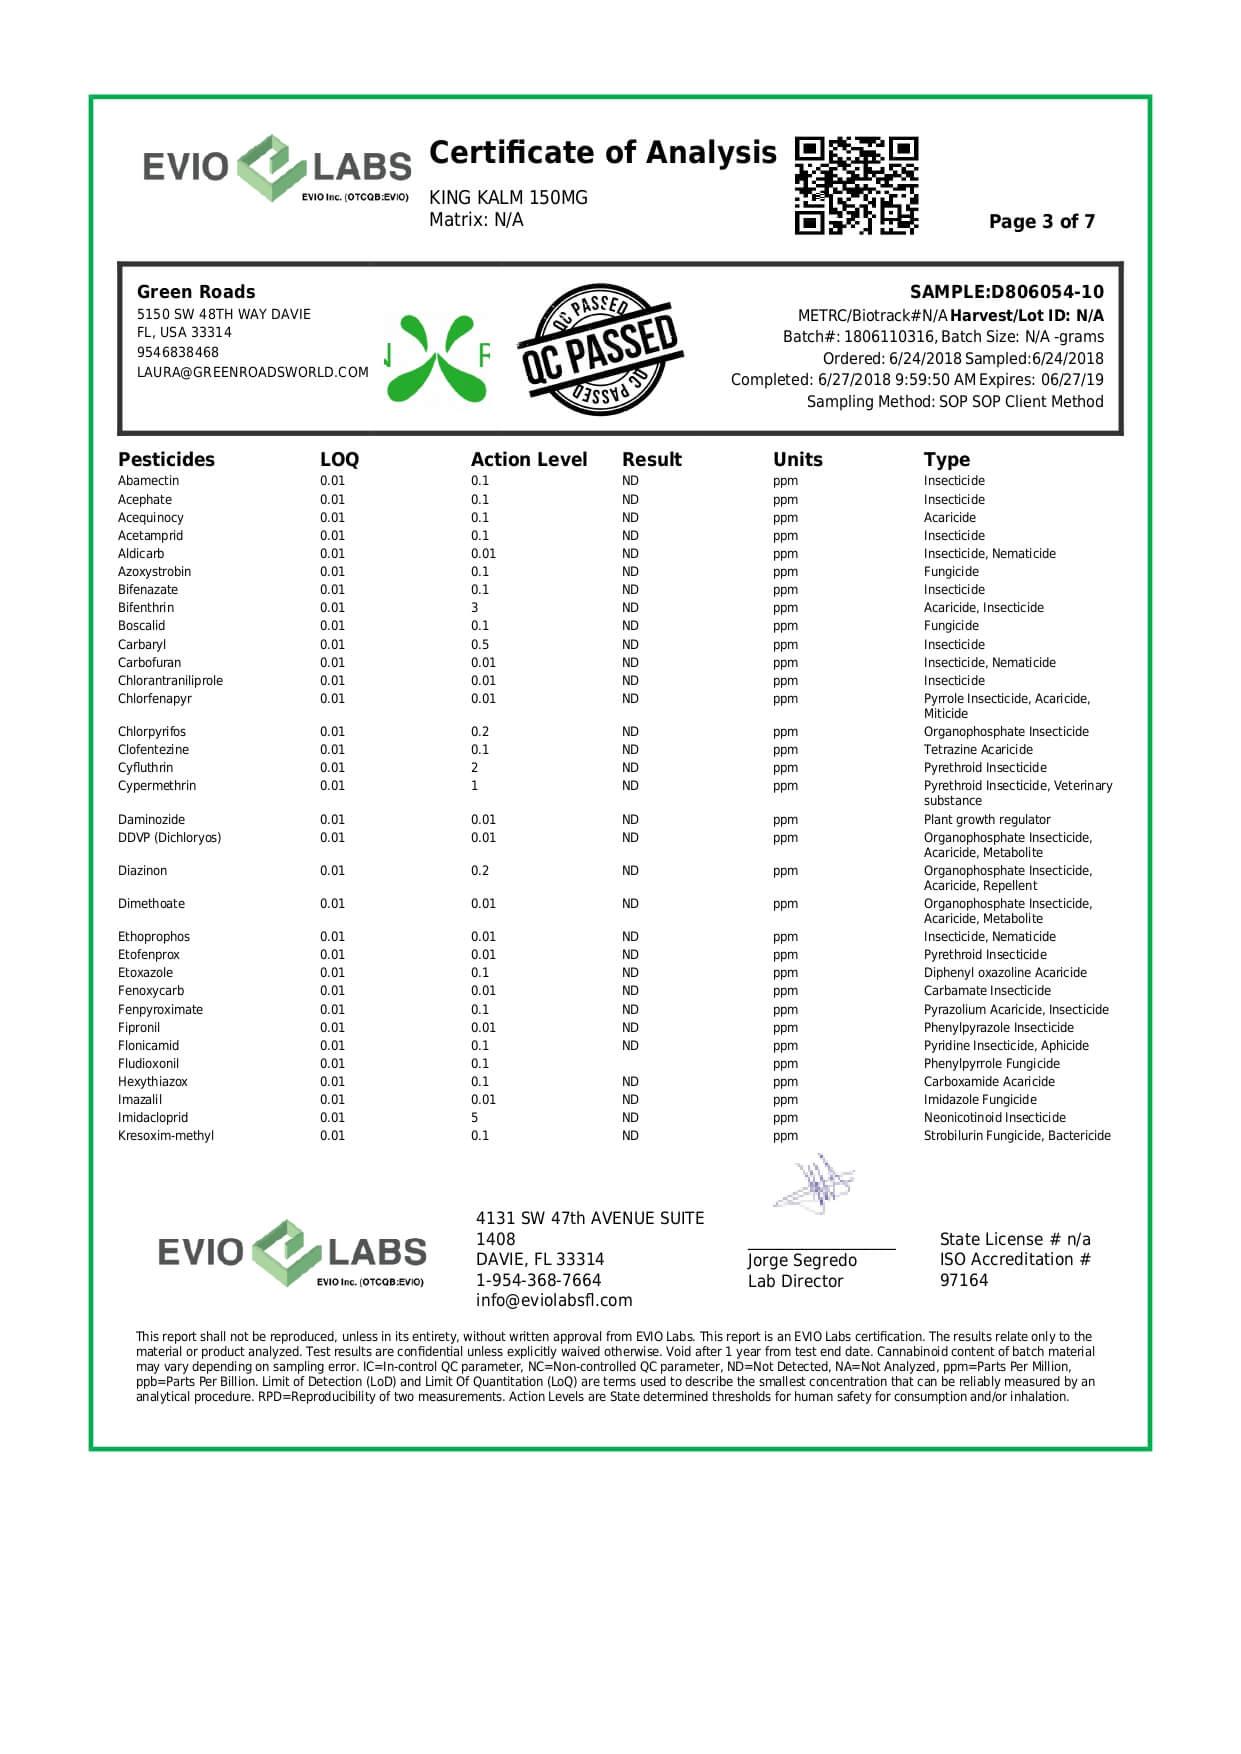 Green Roads CBD Pet Tincture KingKalmCBD Canine Formula 150mg Lab Report